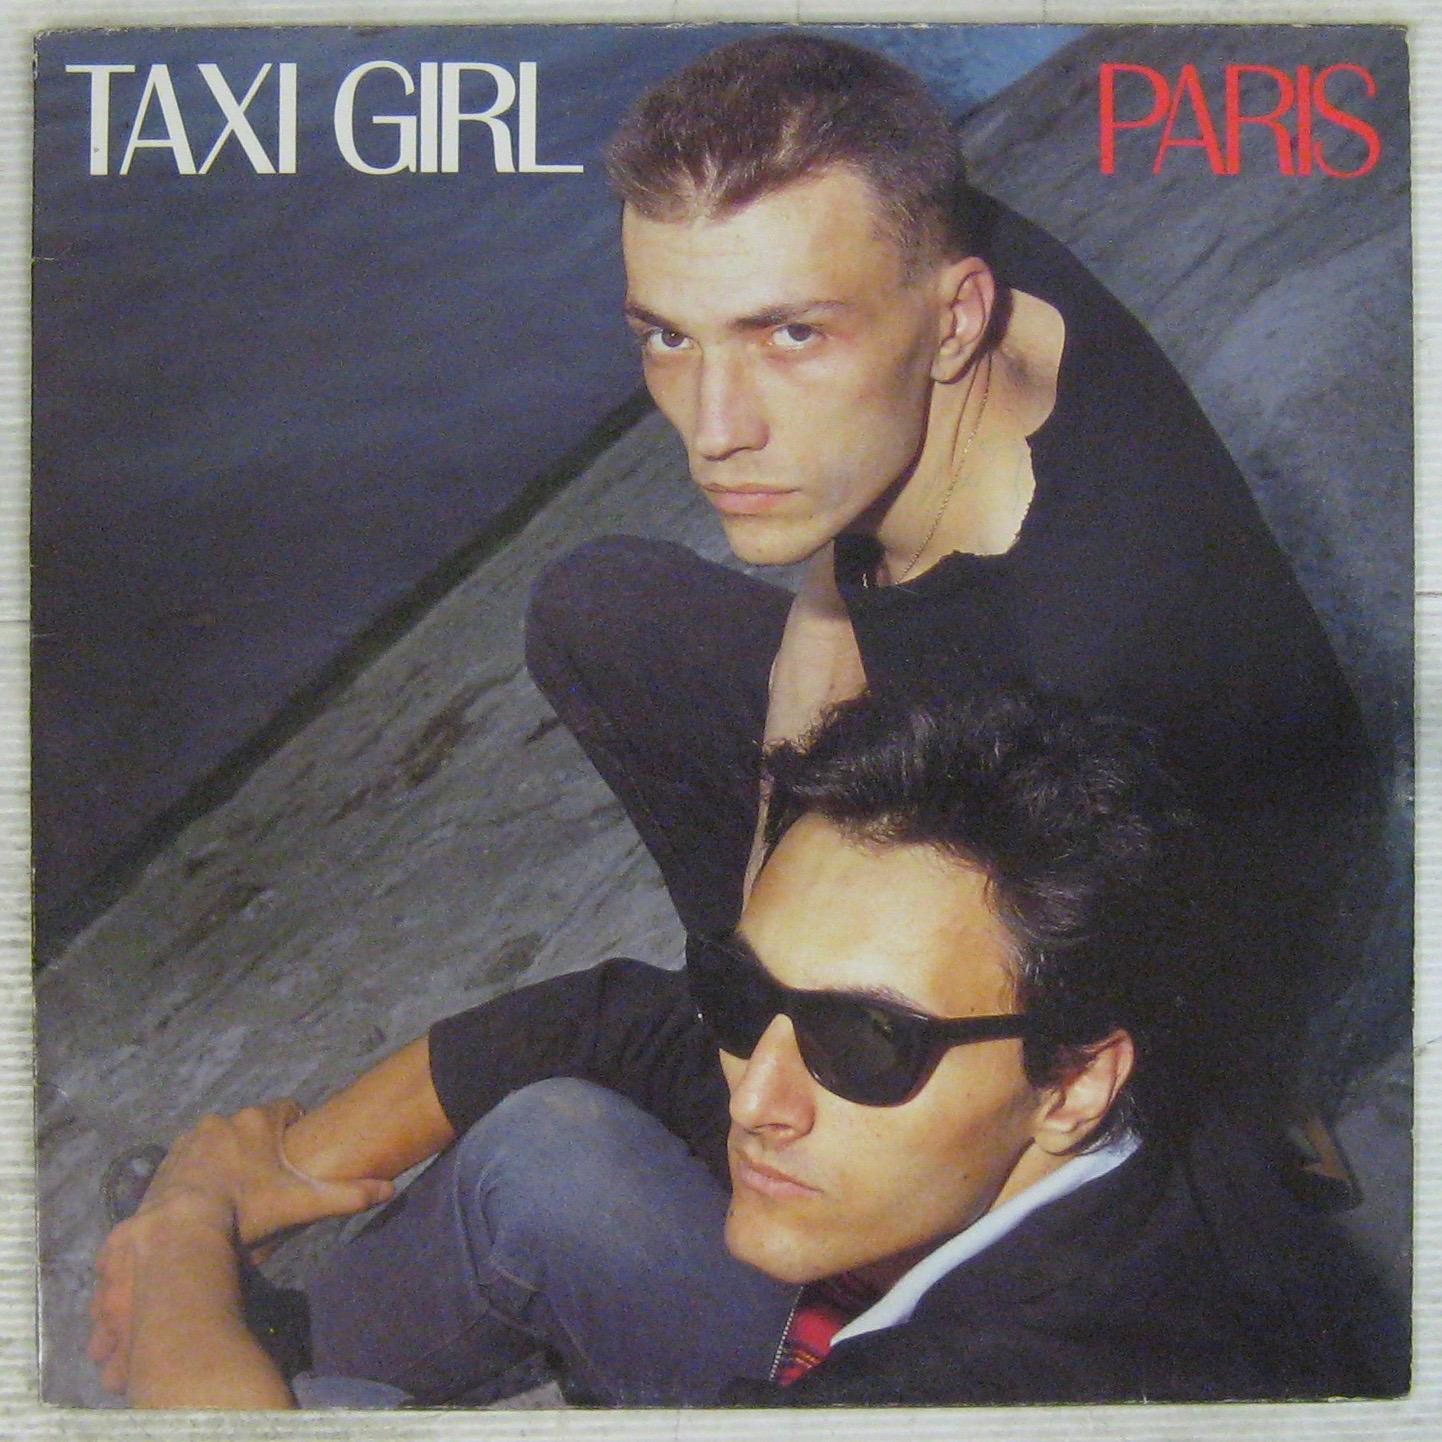 TAXI GIRL - Paris - Maxi 45T